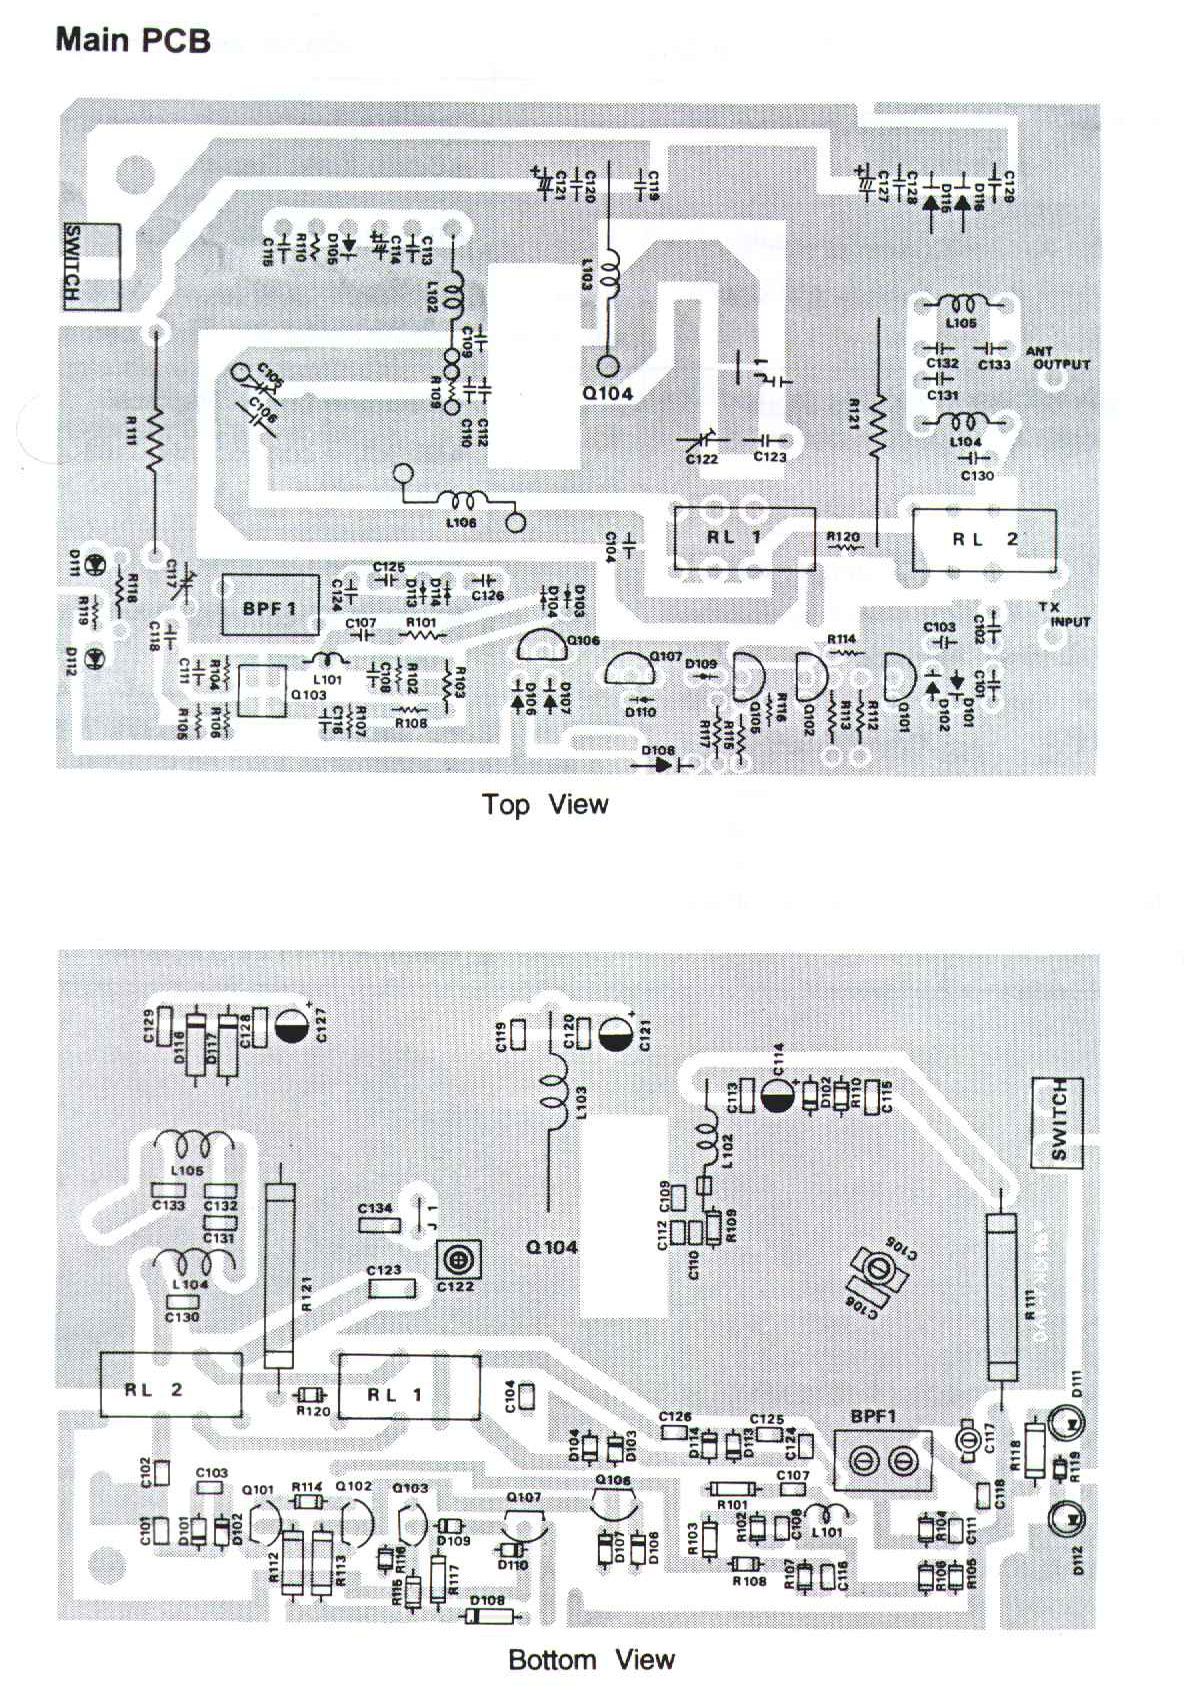 YG_3120] Radio Shack Schematic Diagrams Wiring DiagramIcand Brece Awni Odga Elae Rect Omit Kargi Hone Puti Ixtu Nowa Orsal Emba  Mohammedshrine Librar Wiring 101